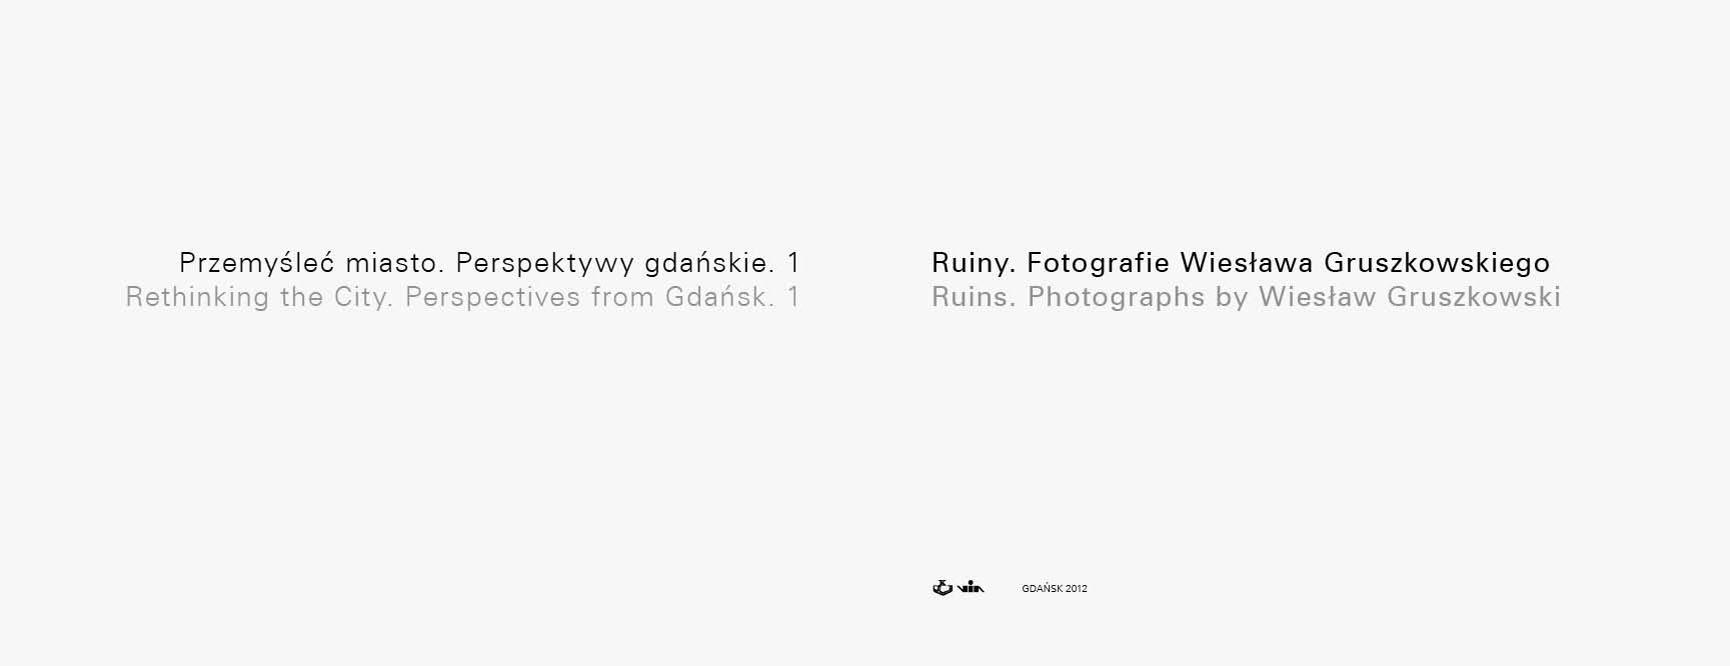 02_Gruszkowski_004